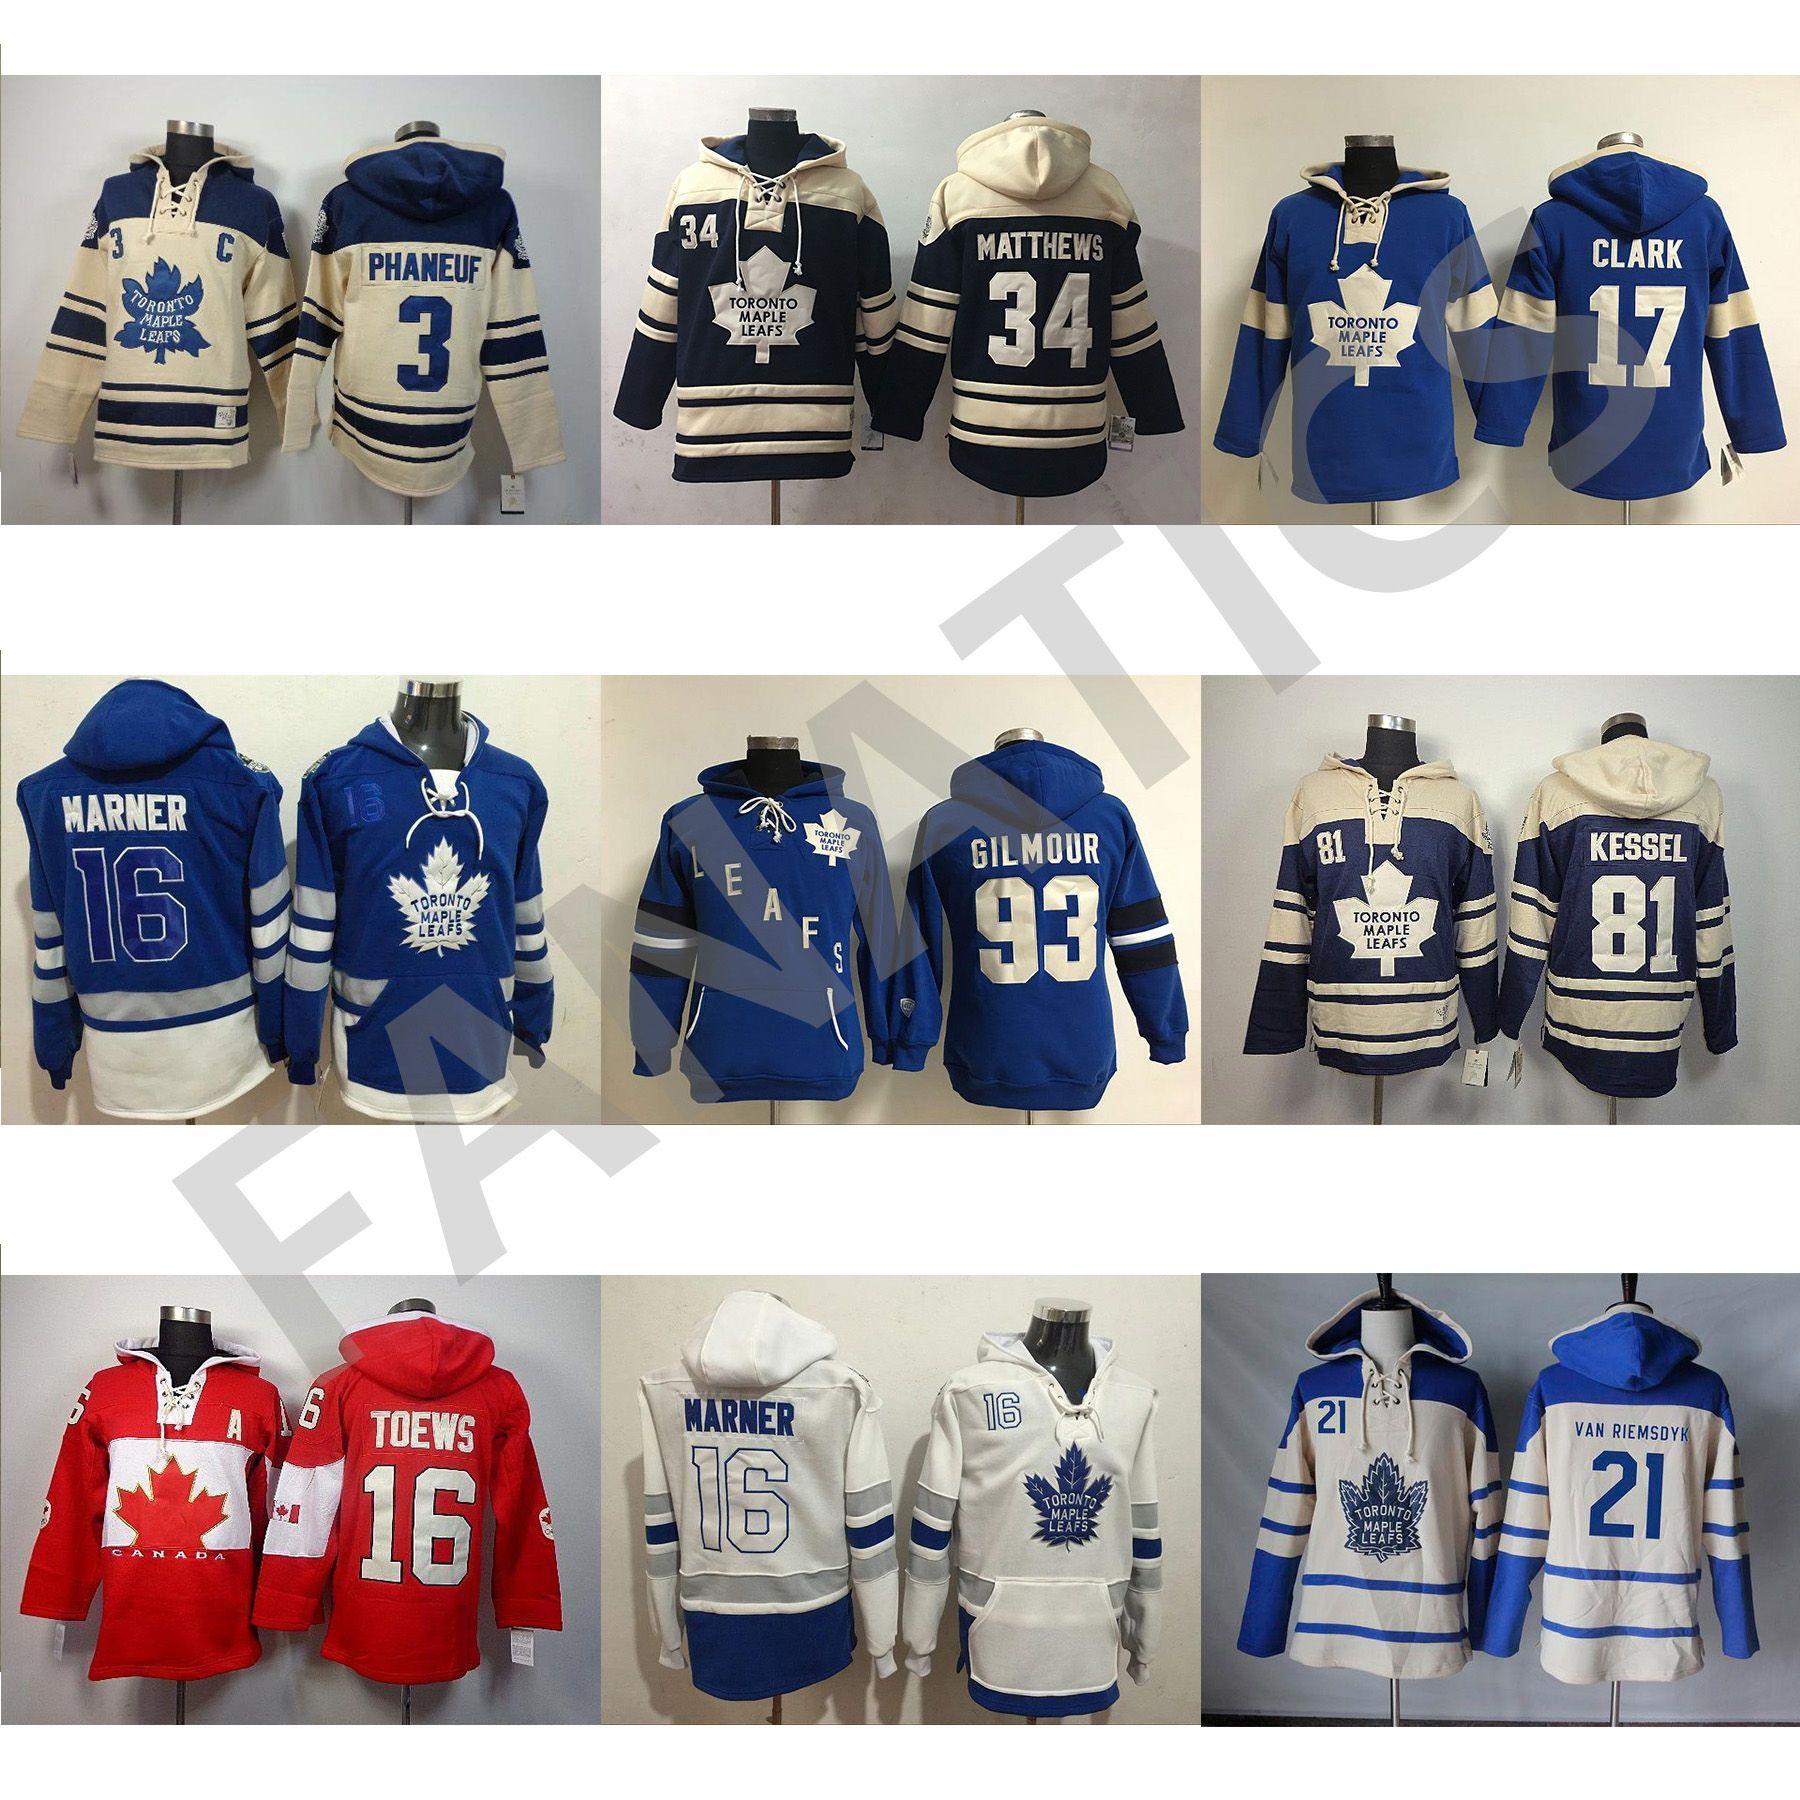 23b0e5fde10 2019 Mens Women Youth Custom Toronto Maple Leafs Hoodie Pullover 21 James  Van 81 Phil Kessel 34 Auston Matthews 91 John Tavares Frederik Andersen  From ...